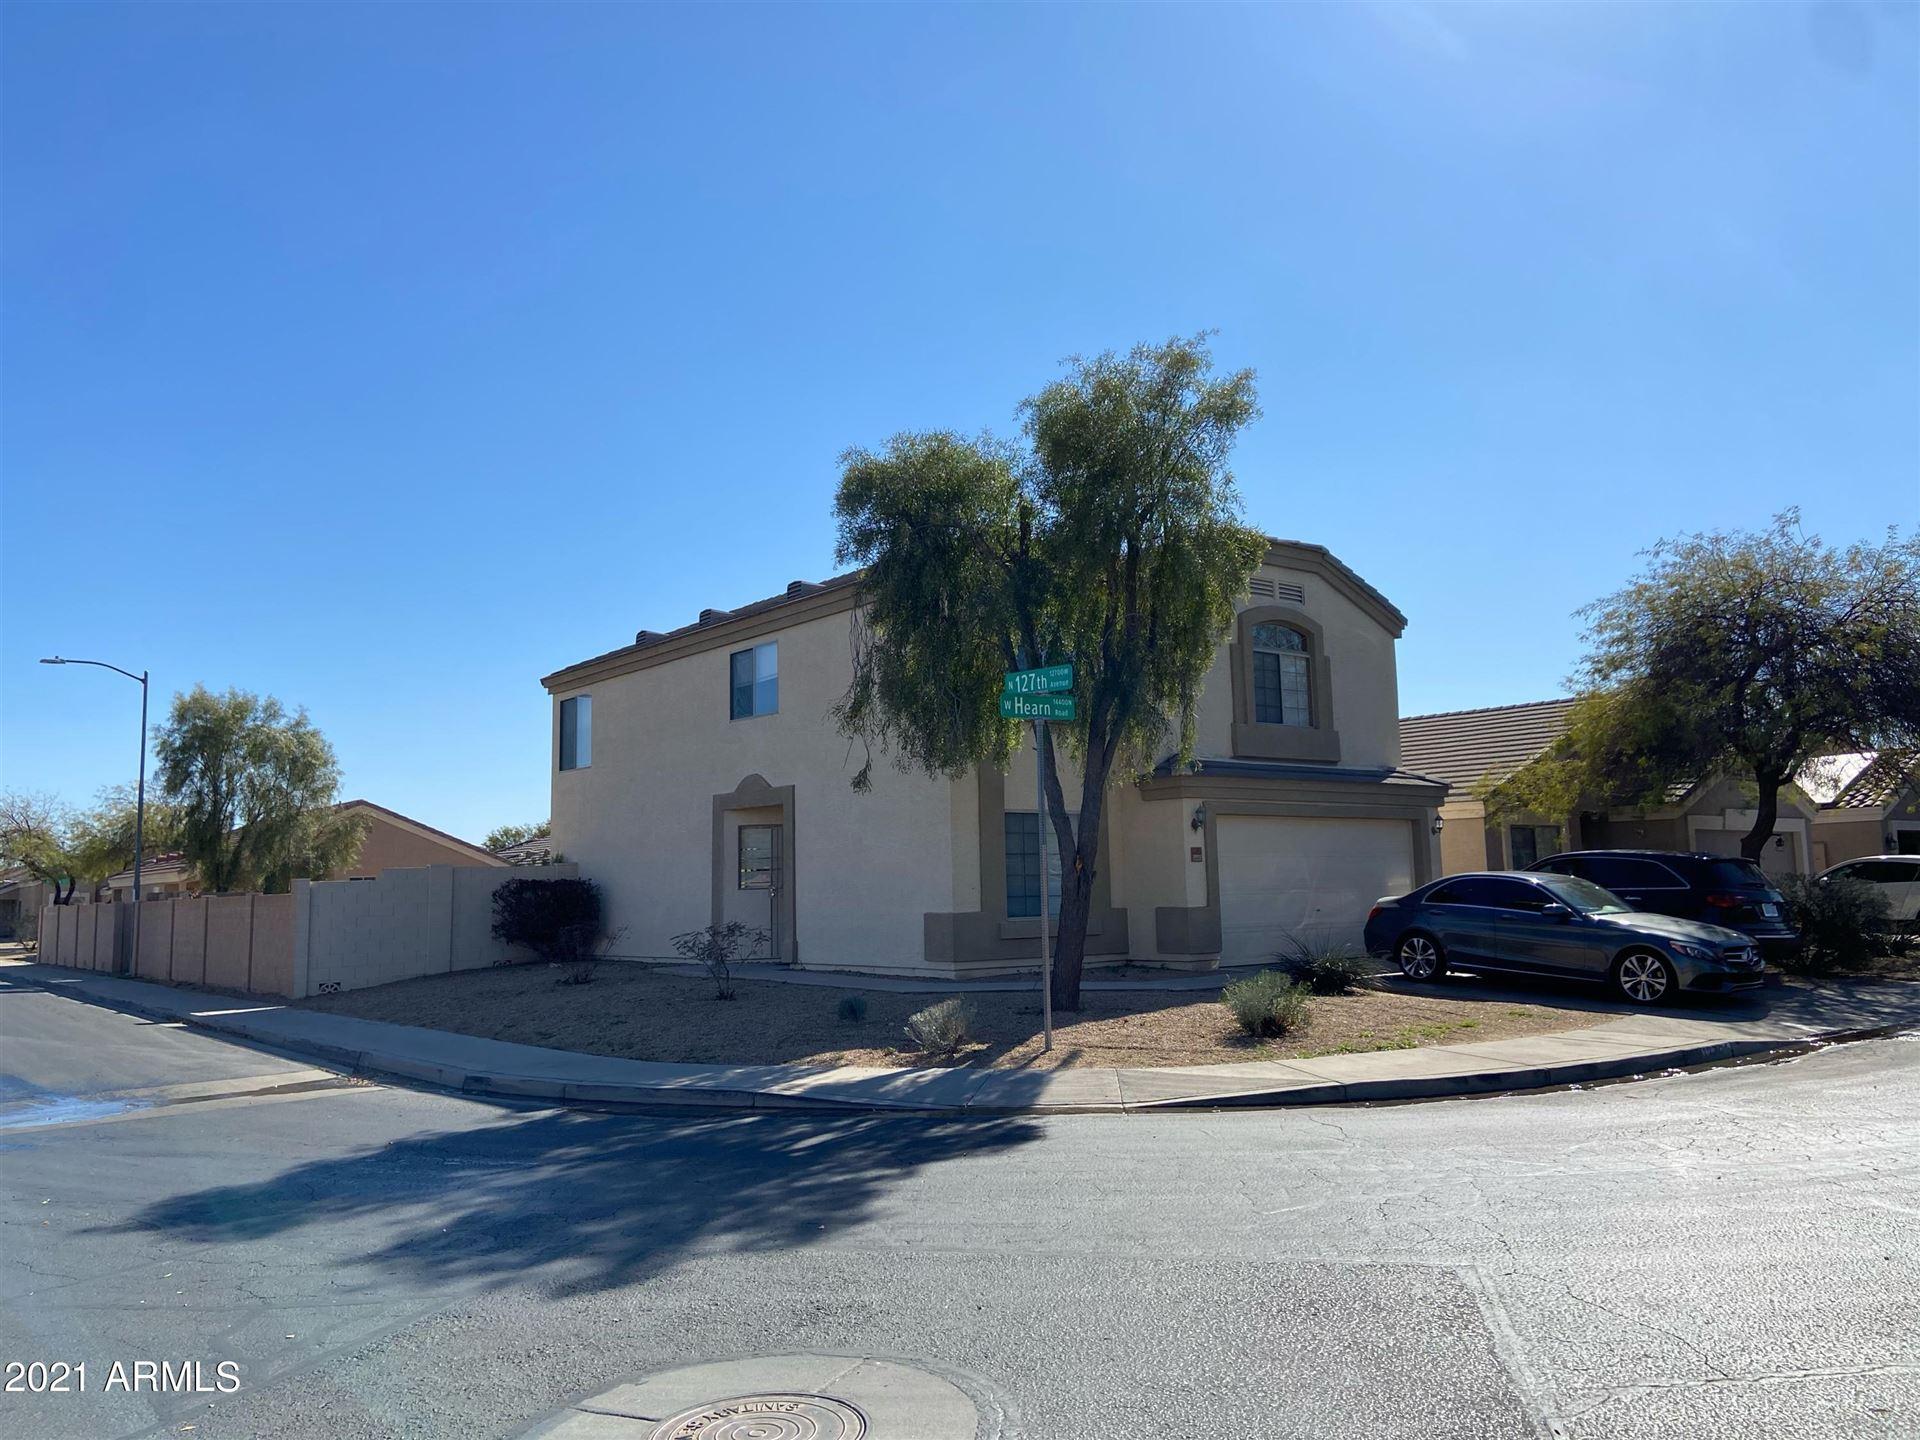 Photo of 12701 W hearn Road, El Mirage, AZ 85335 (MLS # 6198135)